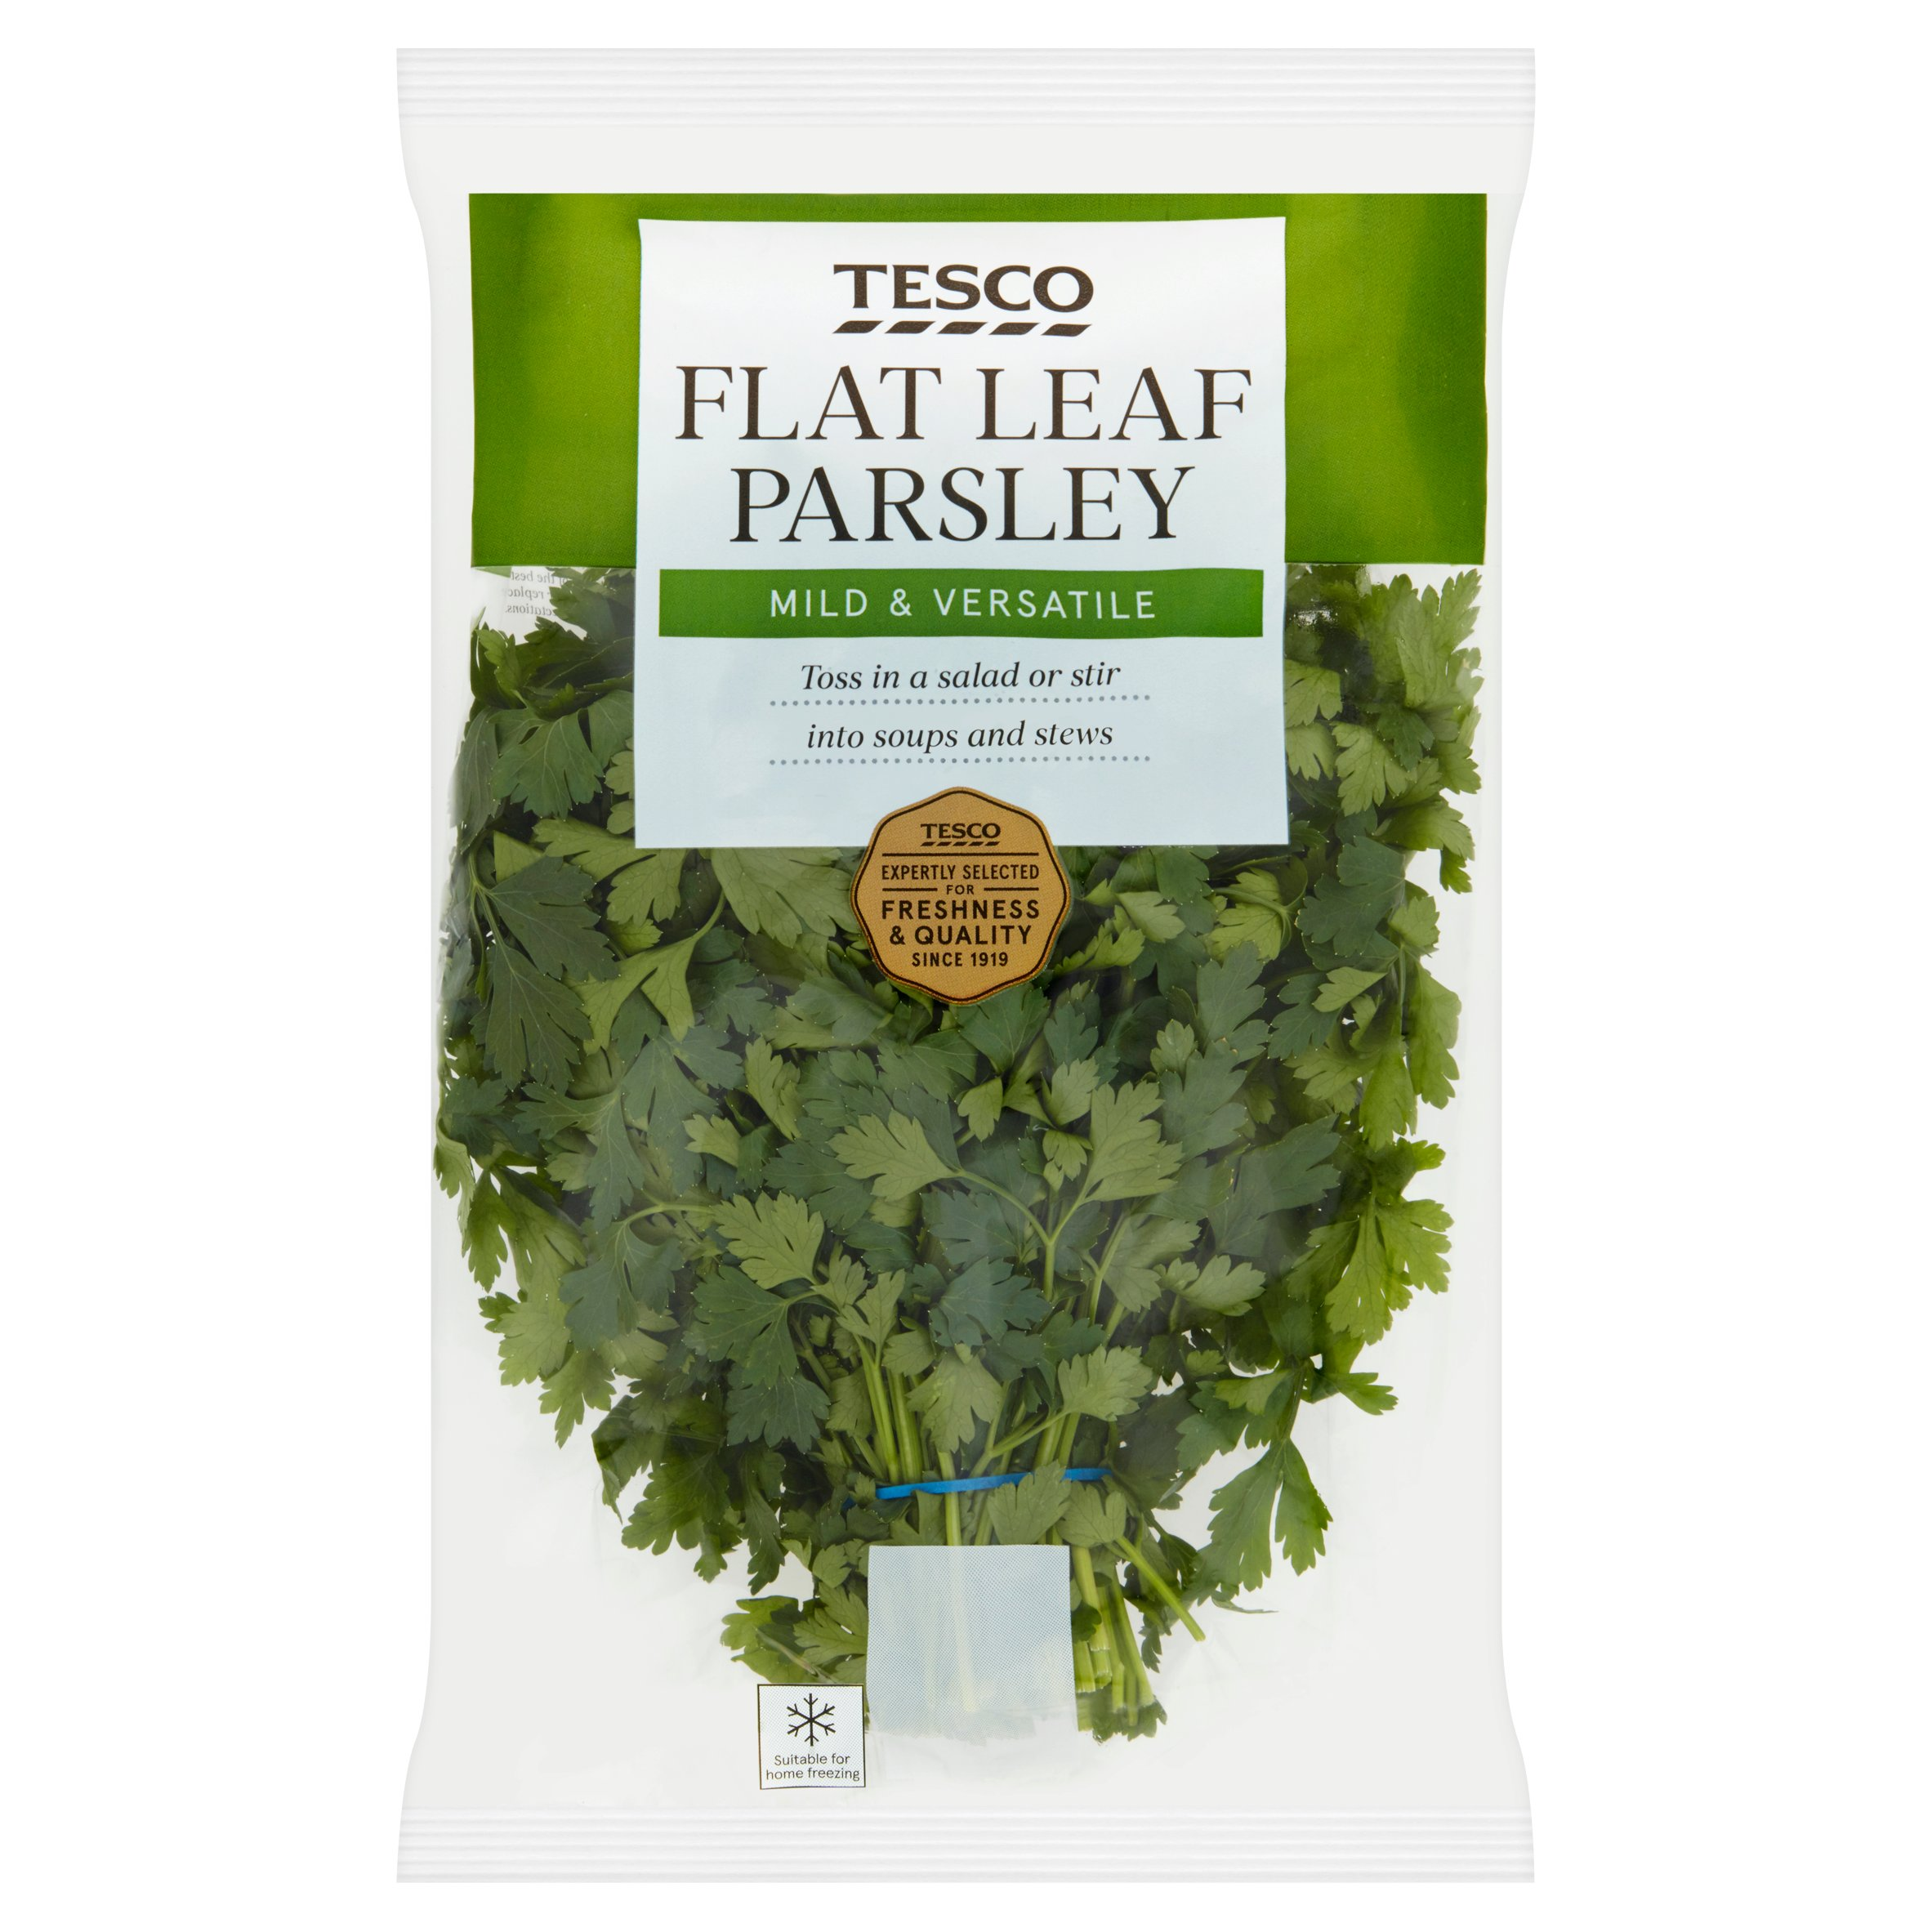 Tesco Flat Leaf Parsley 100G